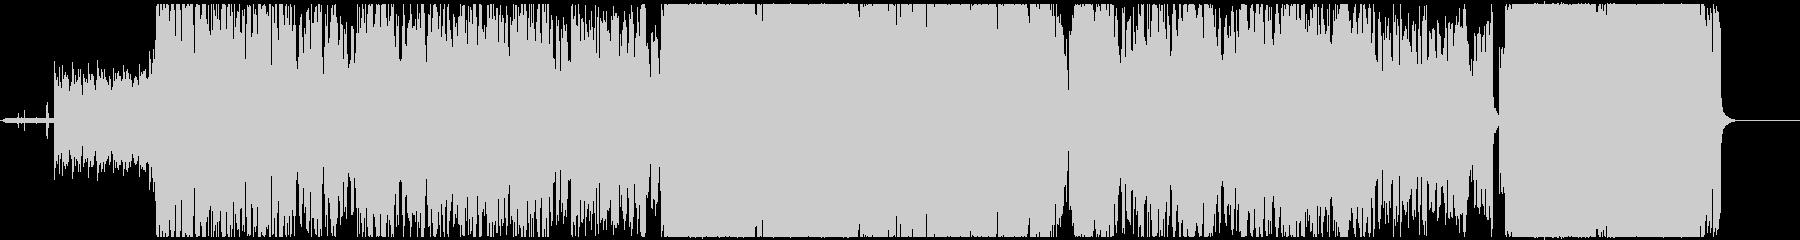 INTERCEPTORの未再生の波形